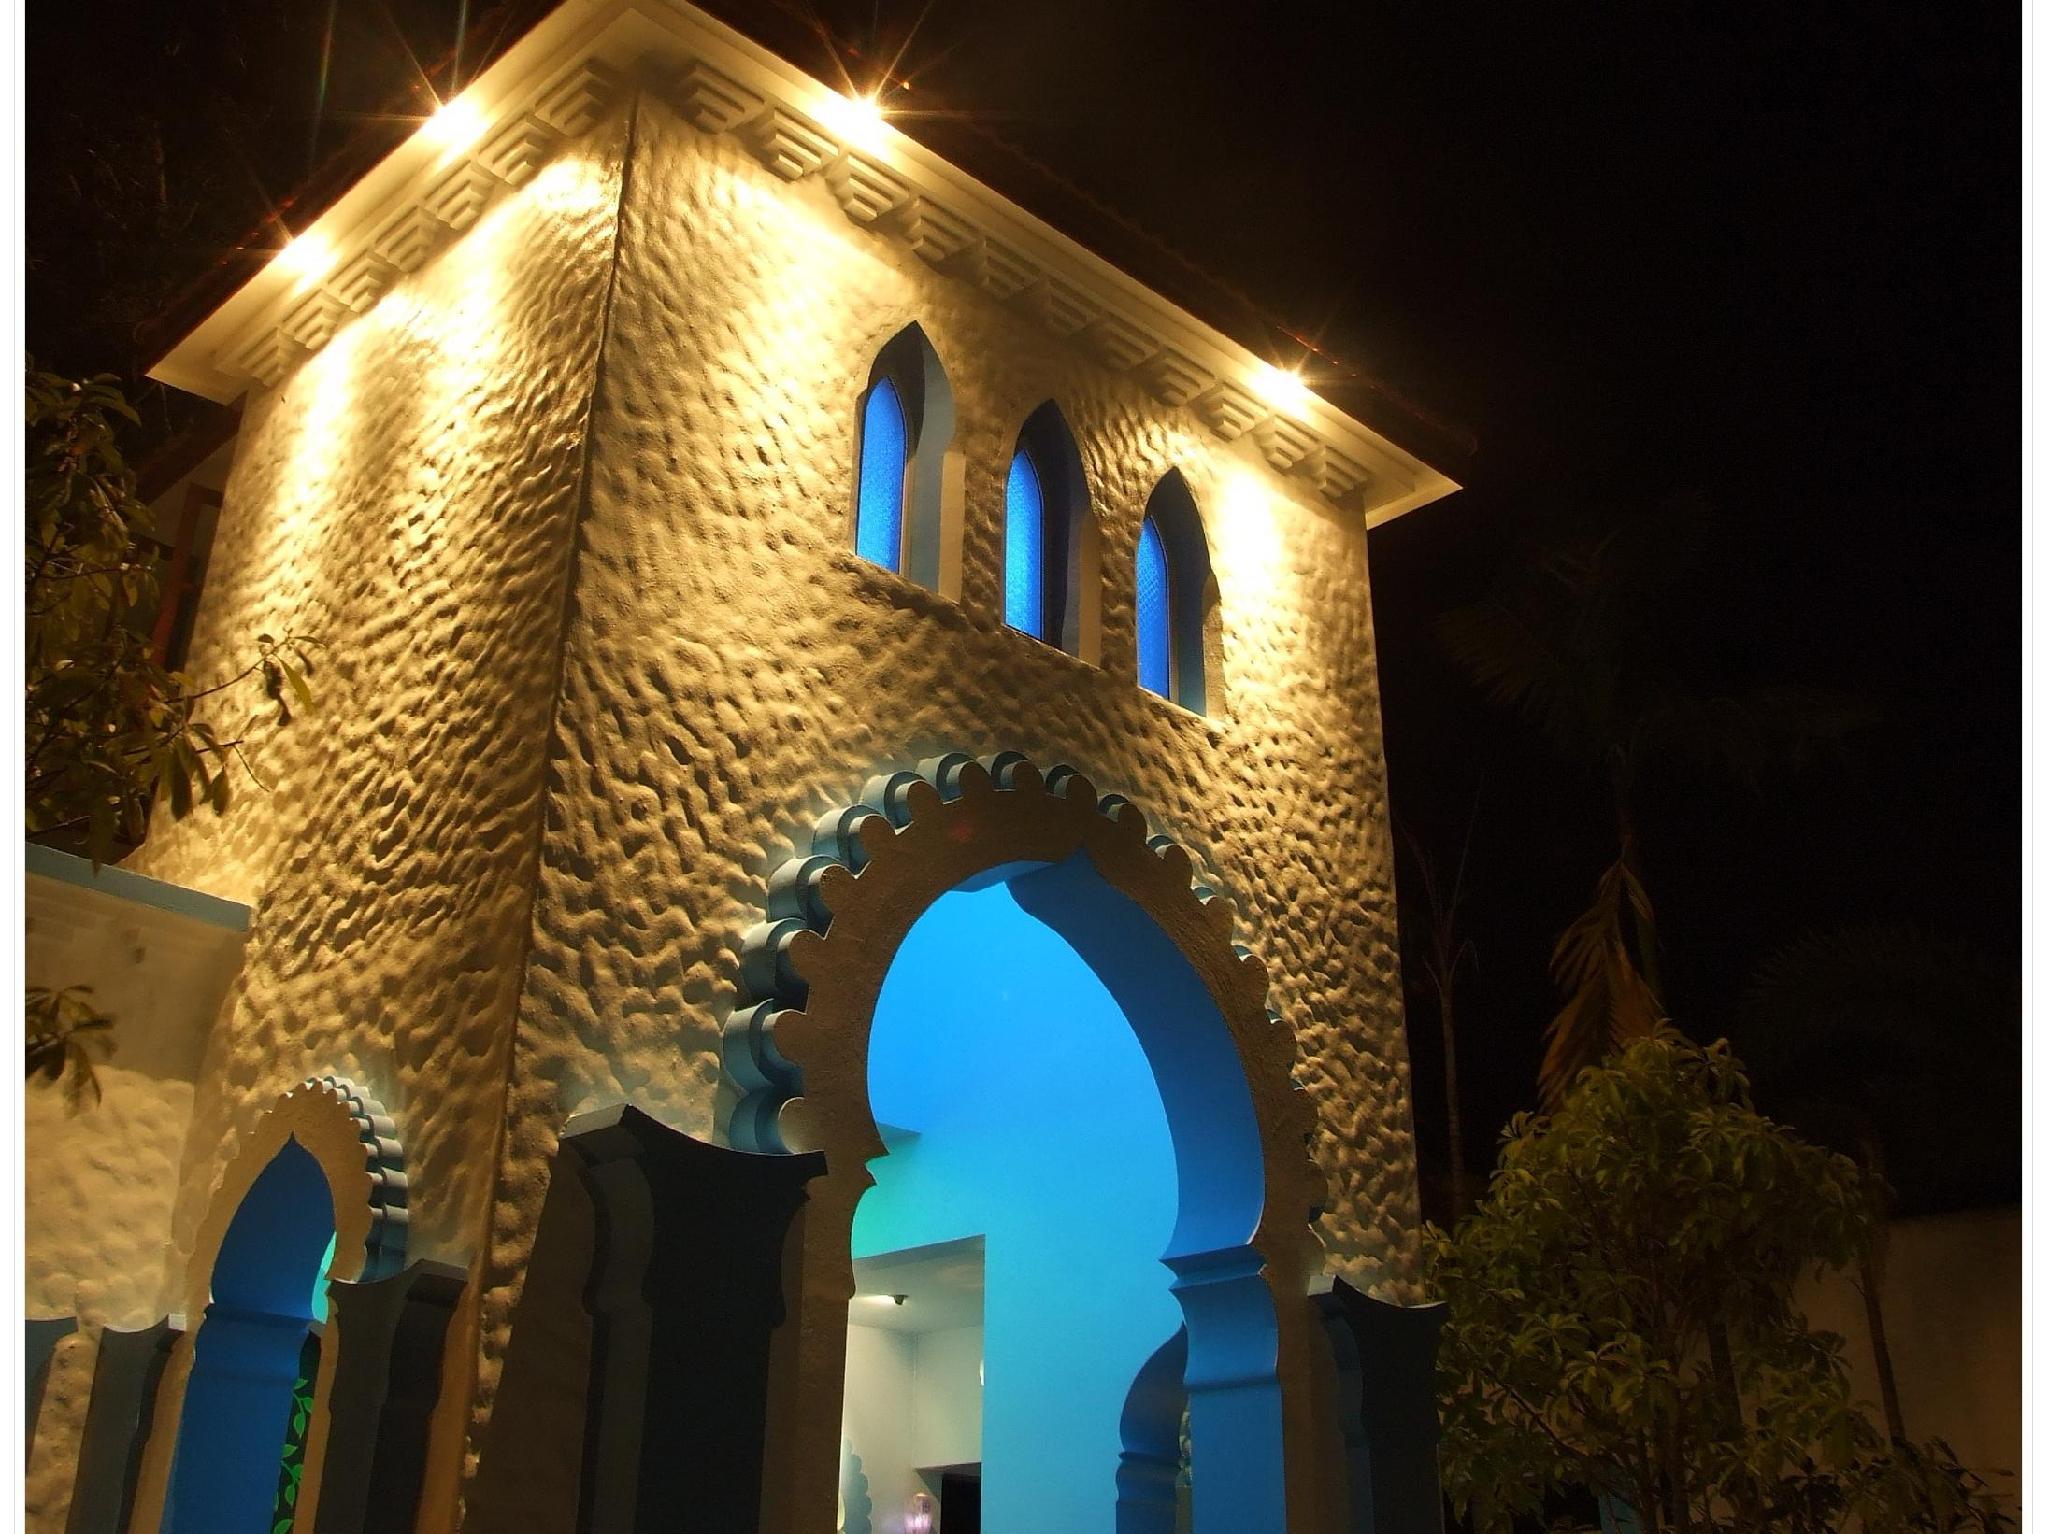 Baan Montra Beach Resort - Bankrut,บ้านมนตราบีช รีสอร์ท-บ้านกรูด